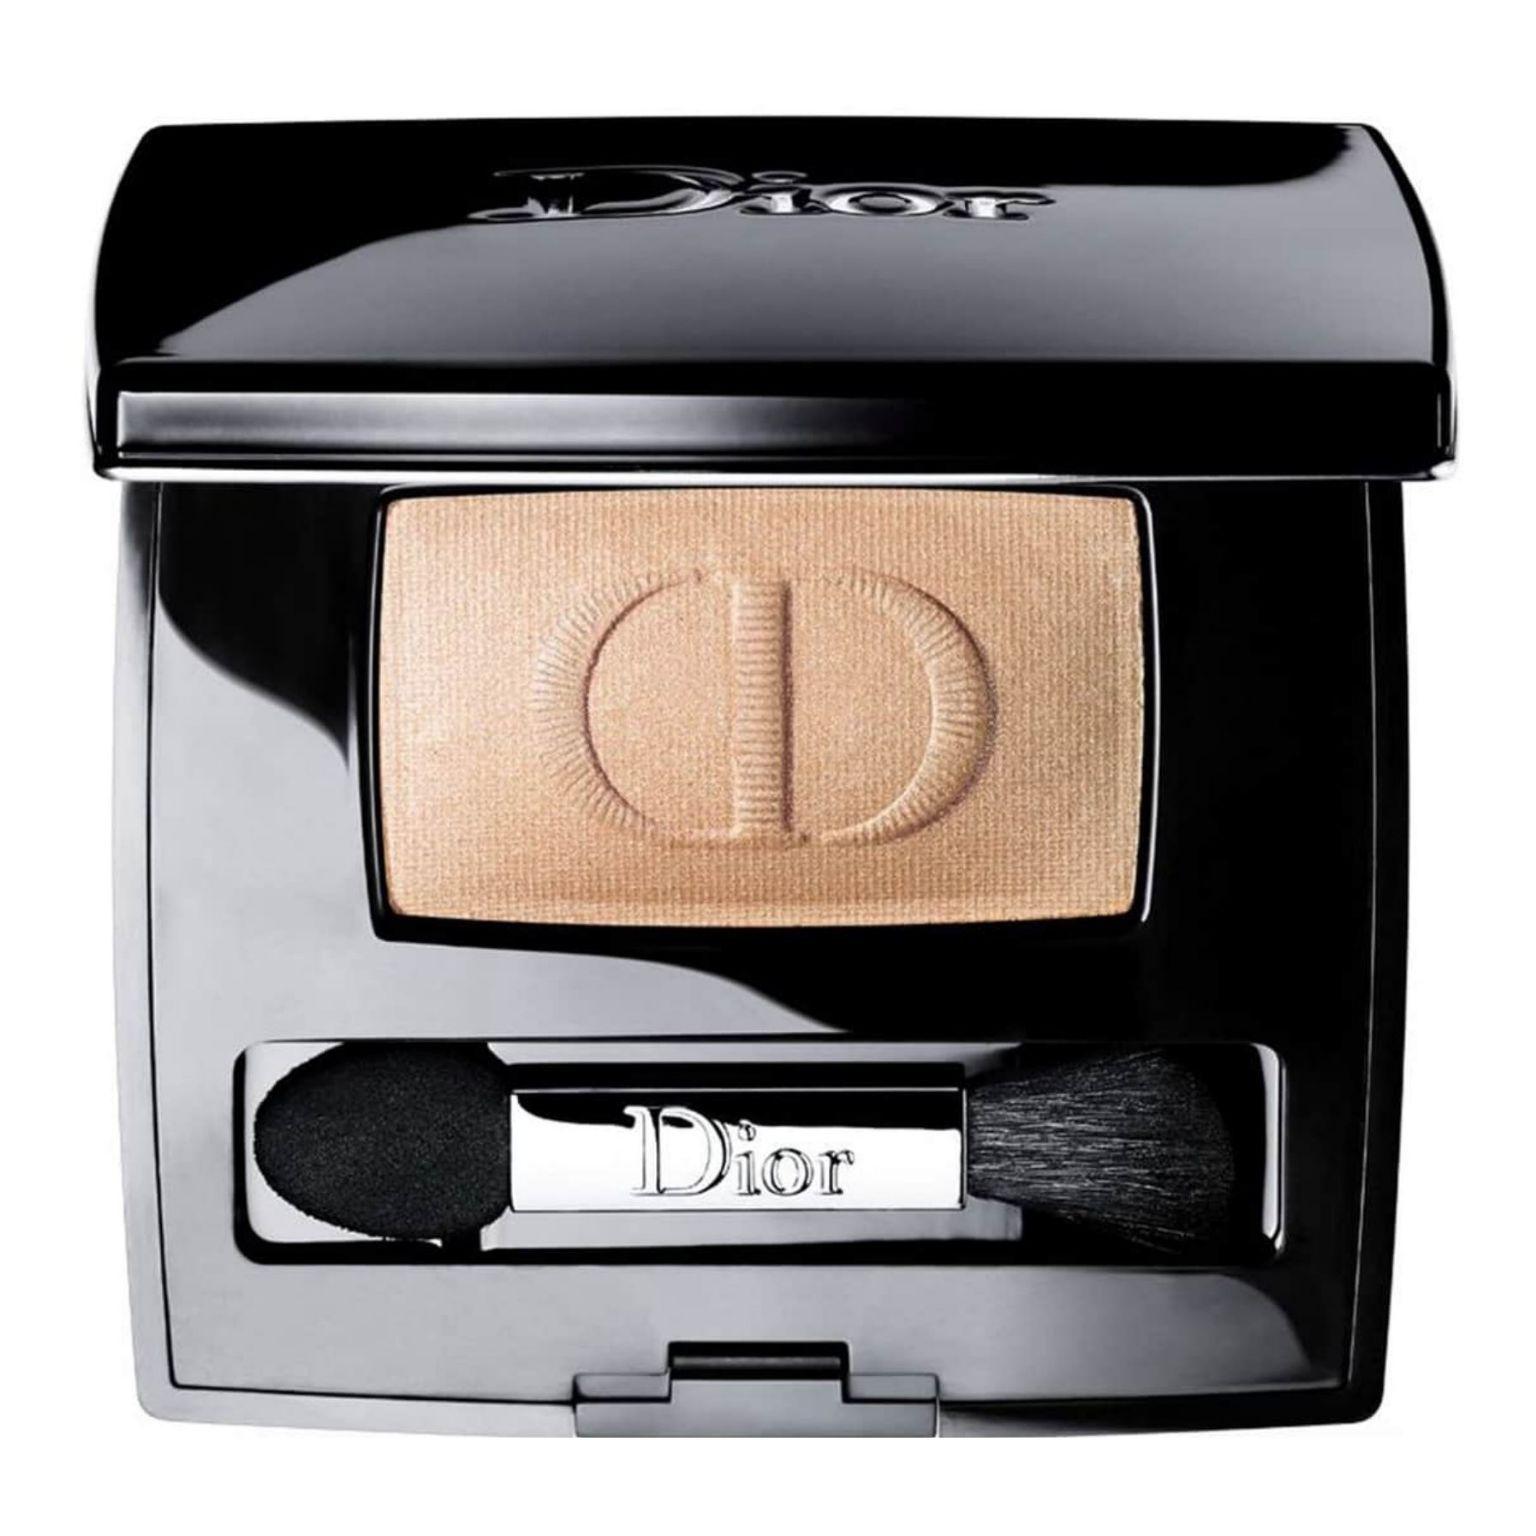 Diorshow Mono Professional Eye Shadow - Gallery